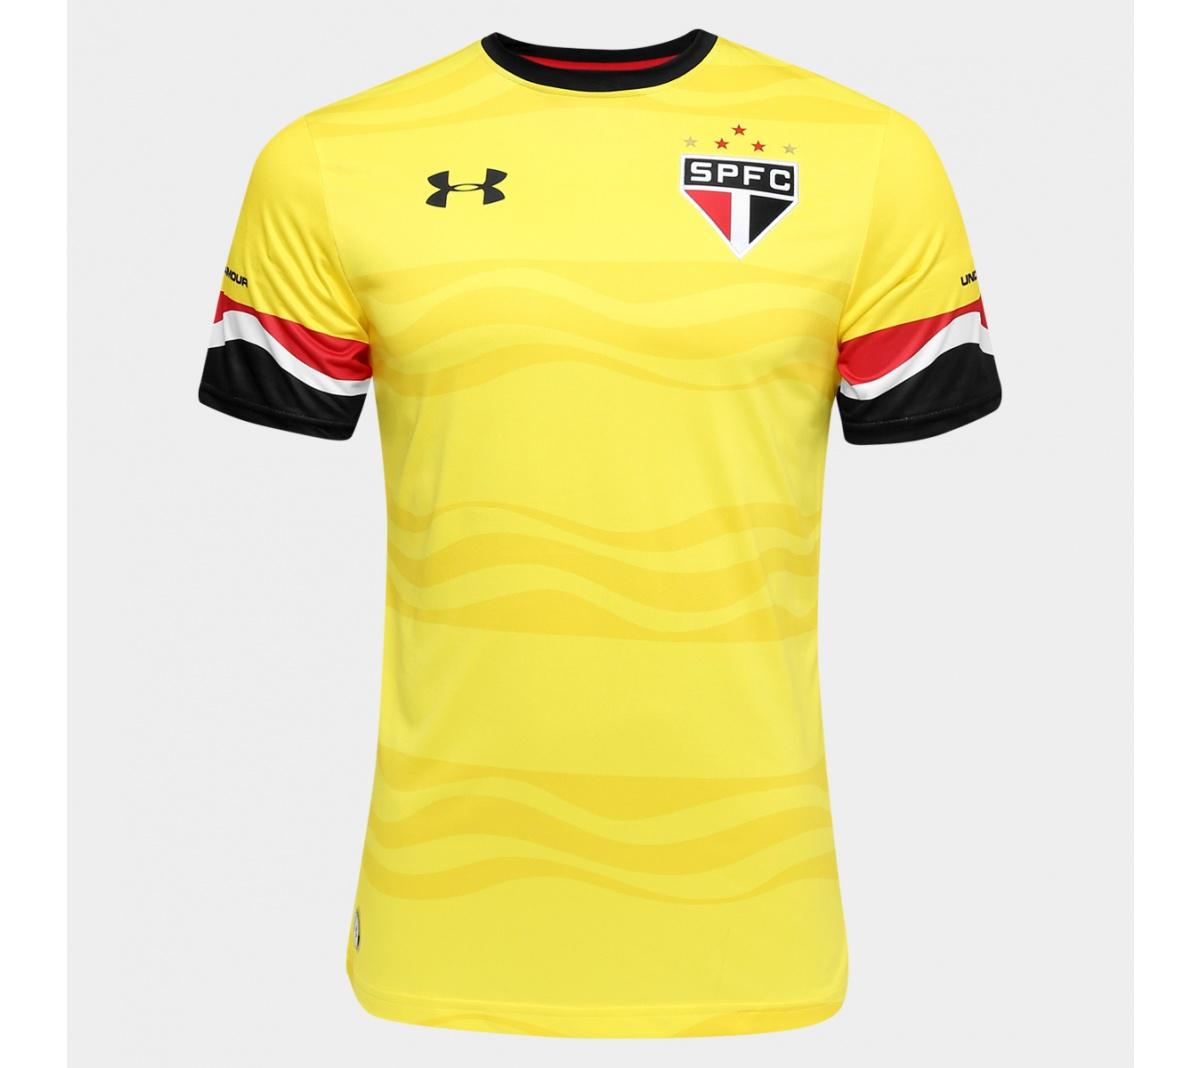 Camisa São Paulo III Under Armour Oficial 2016/17